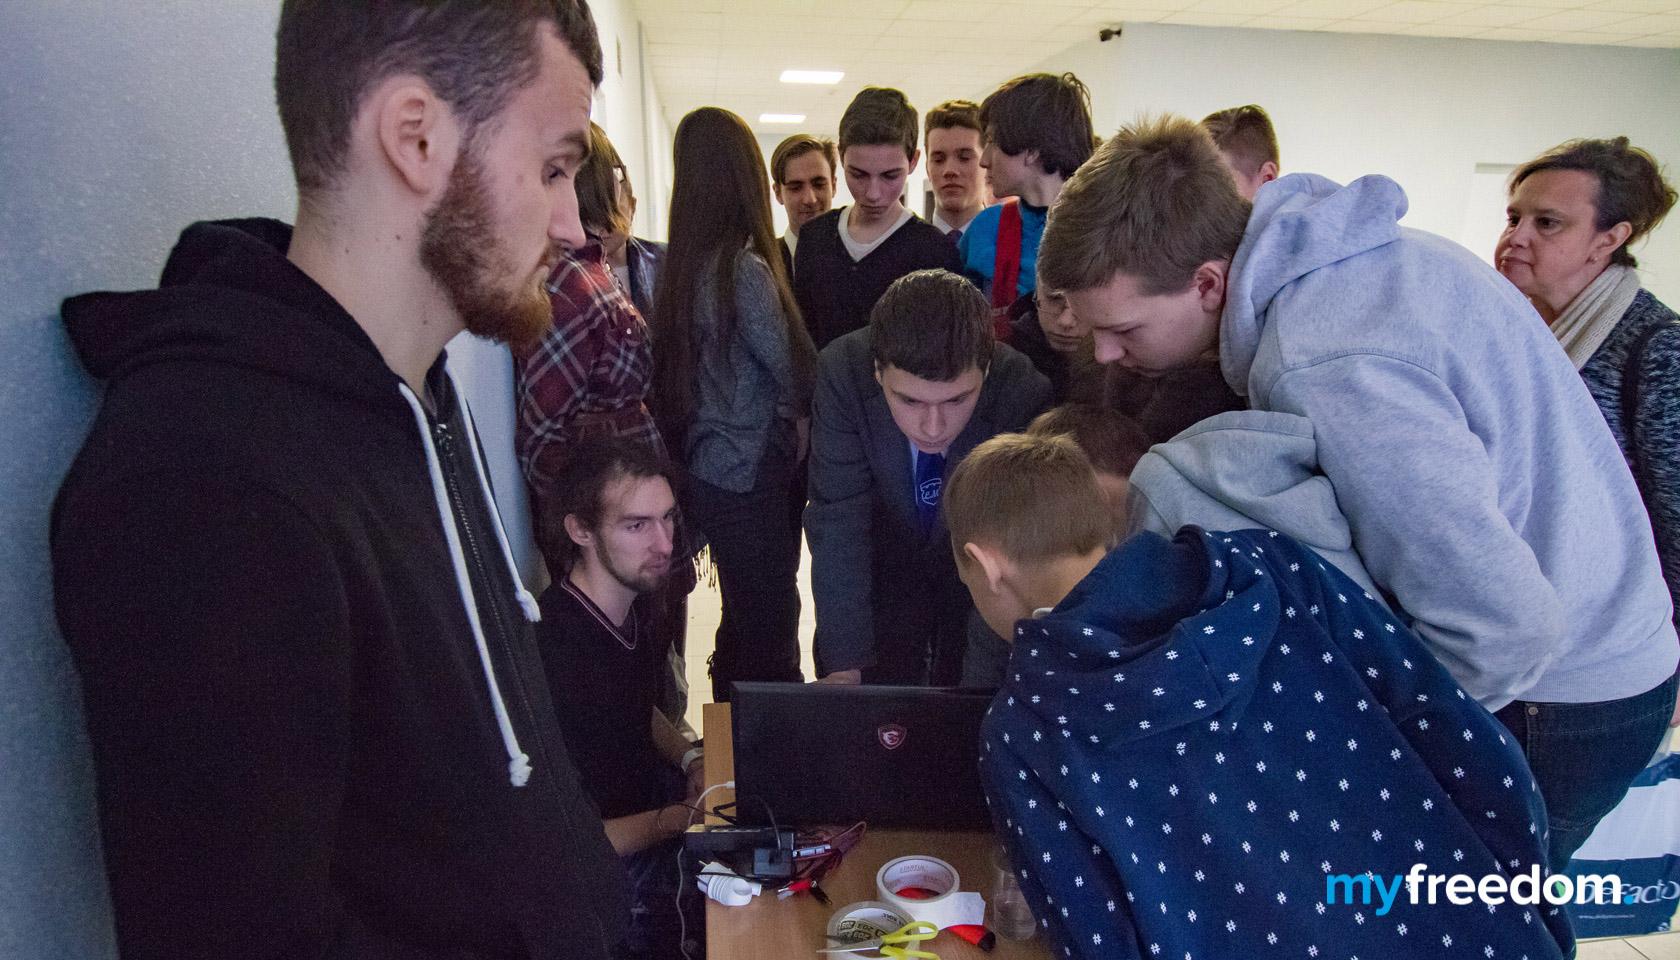 Конференция Pro.IT в Бресте. Myfreedom - первая IT-школа в Бресте. Робототехника